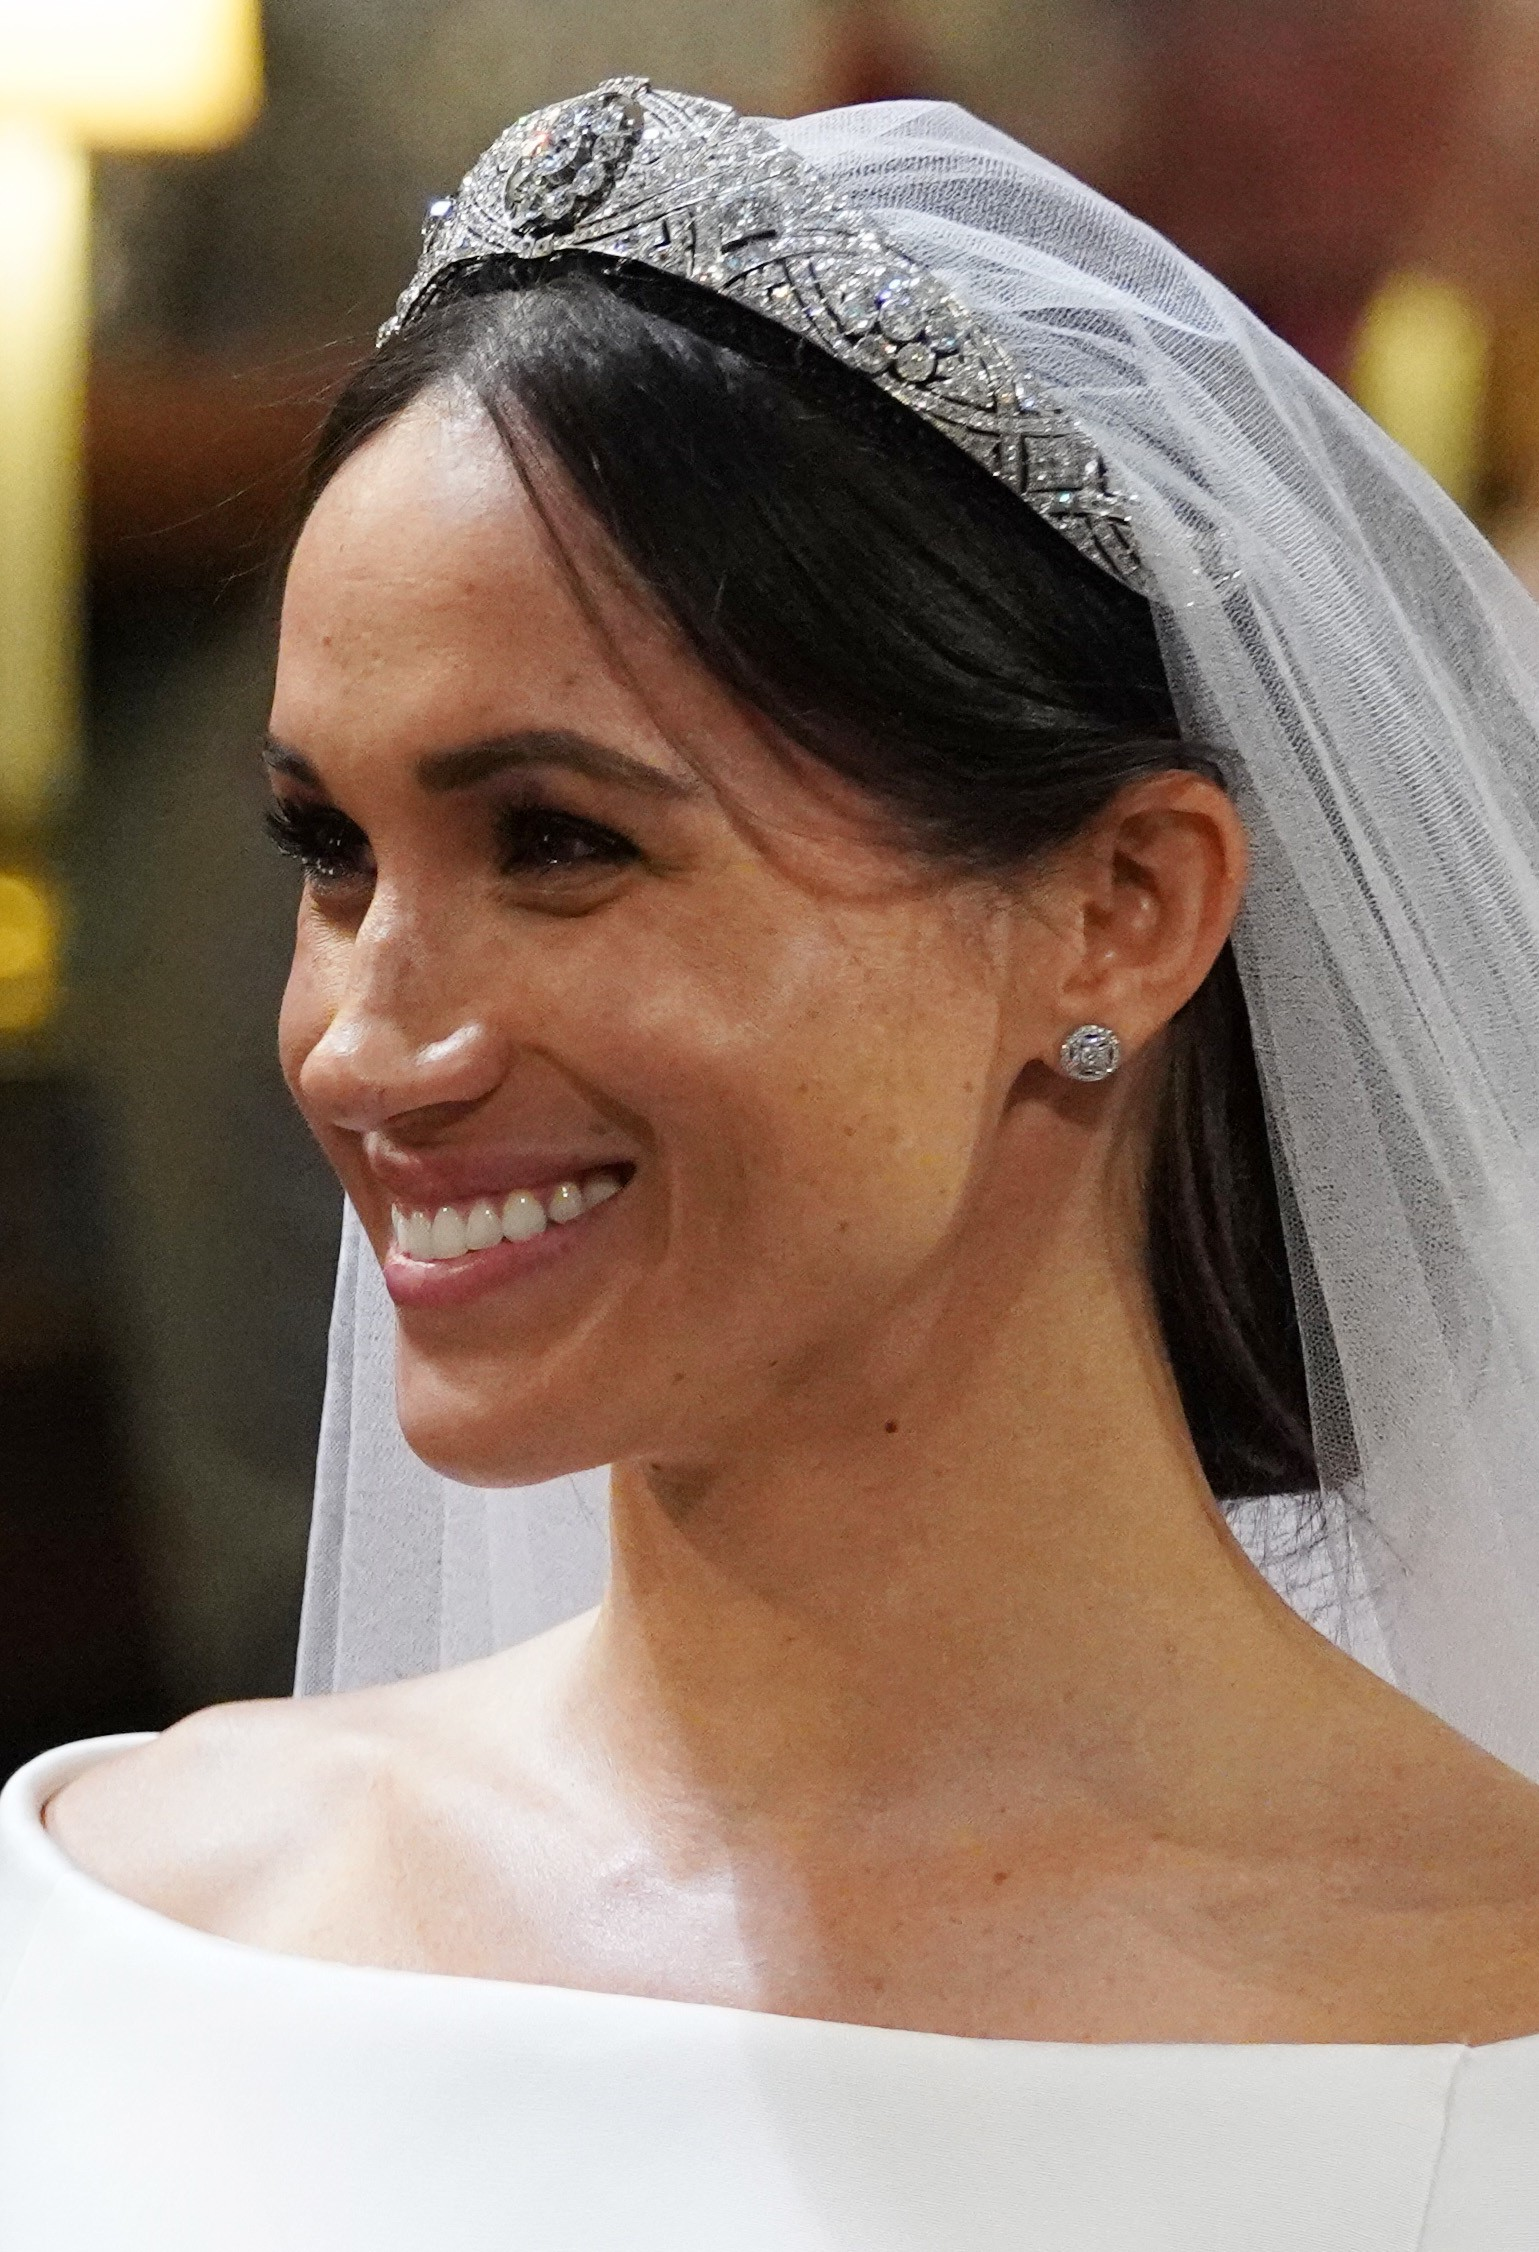 meghan-markle-espectacular-con-su-tiara-filigree